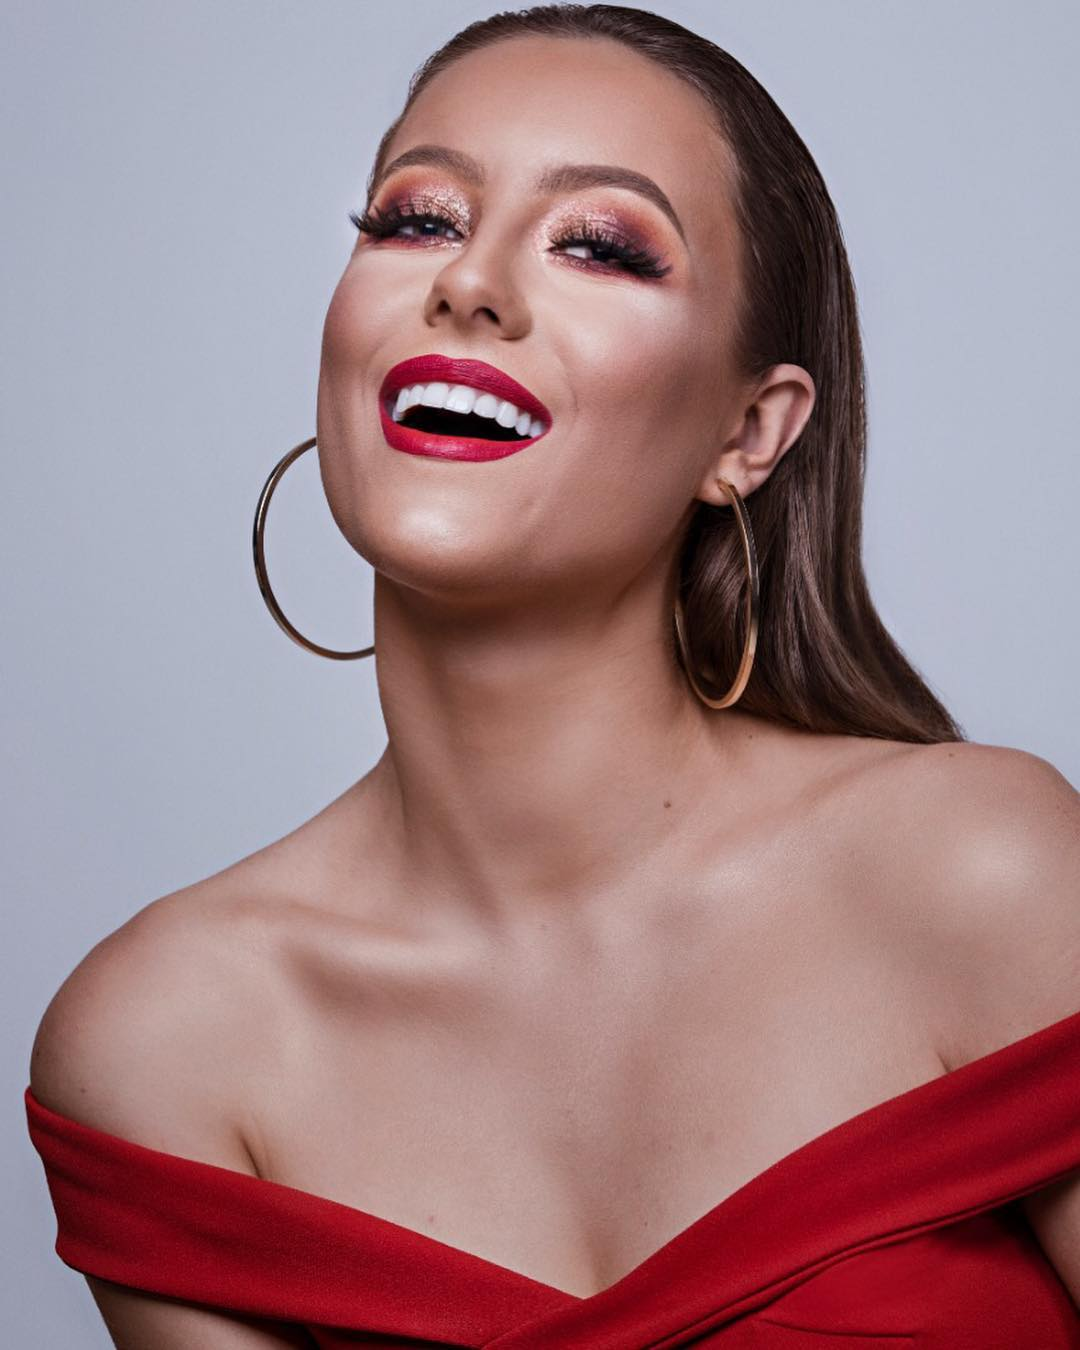 cristine boff sartor, segunda finalista de miss latinoamerica 2019. - Página 5 47692115